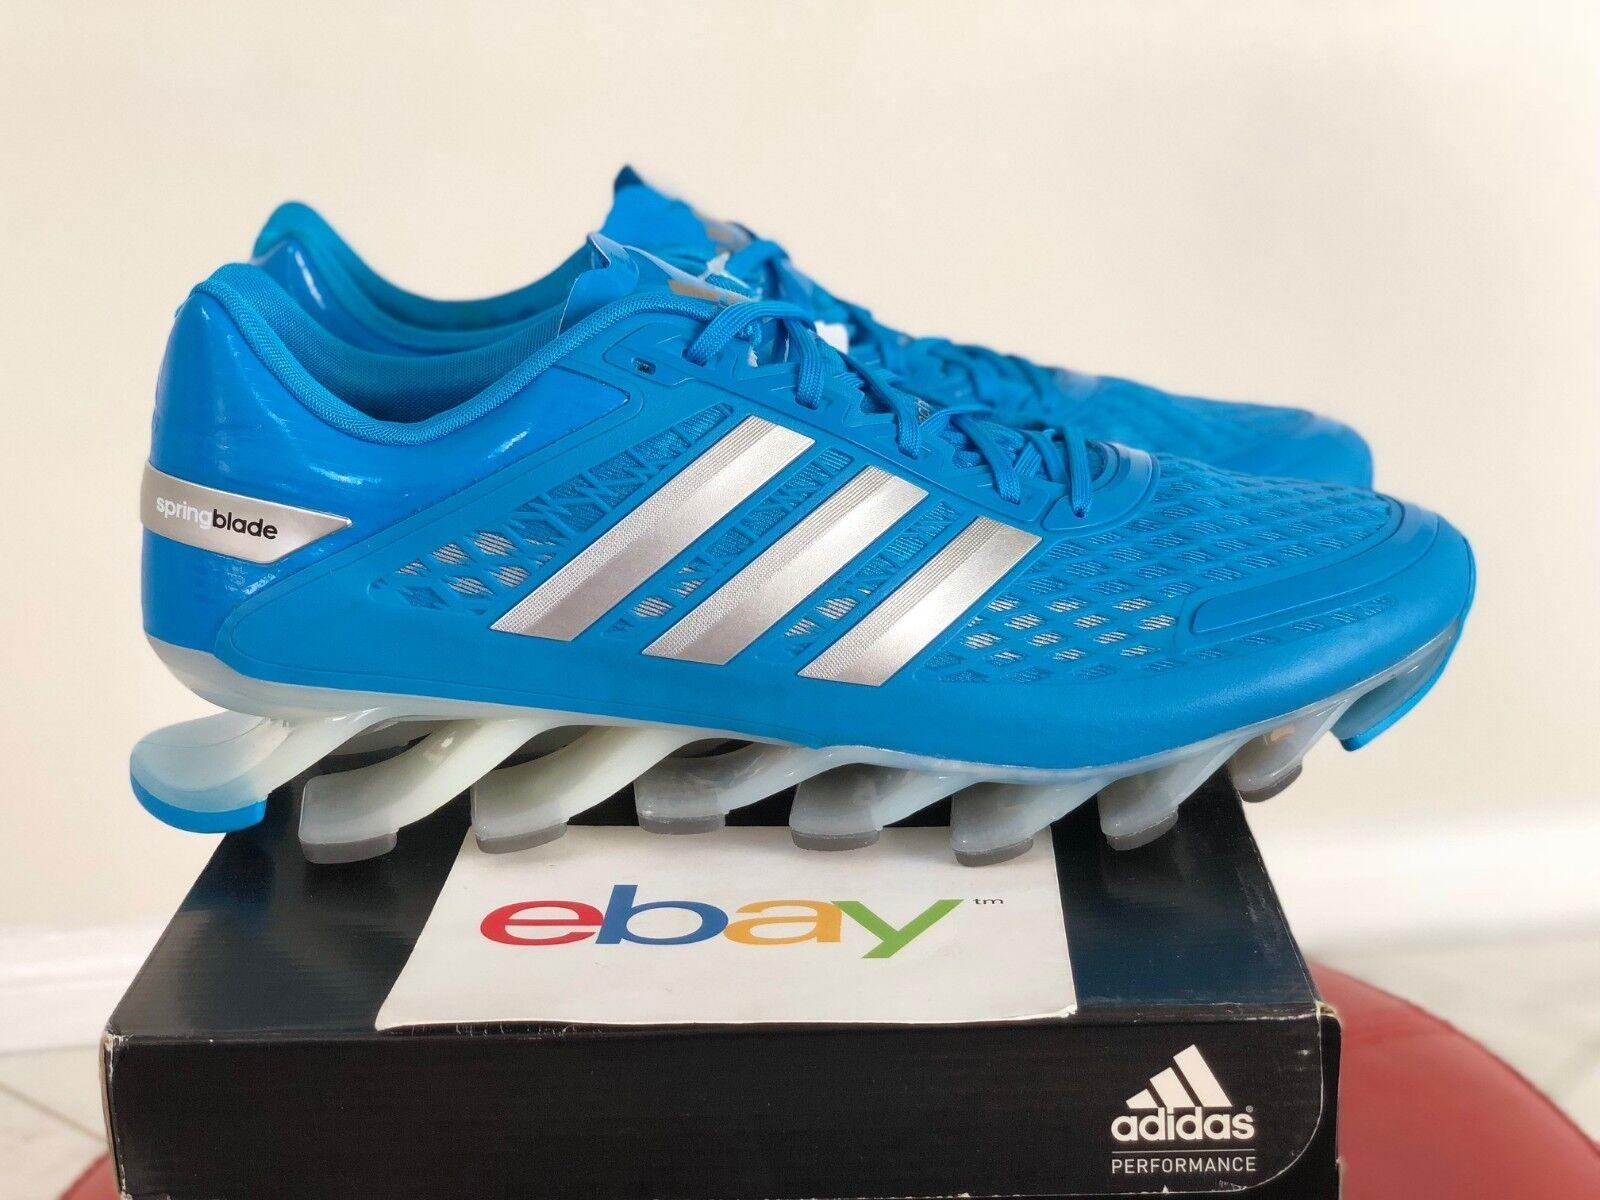 NEW Mens Adidas Springblade SKY BLUE Size 13 metallic silver white runner D